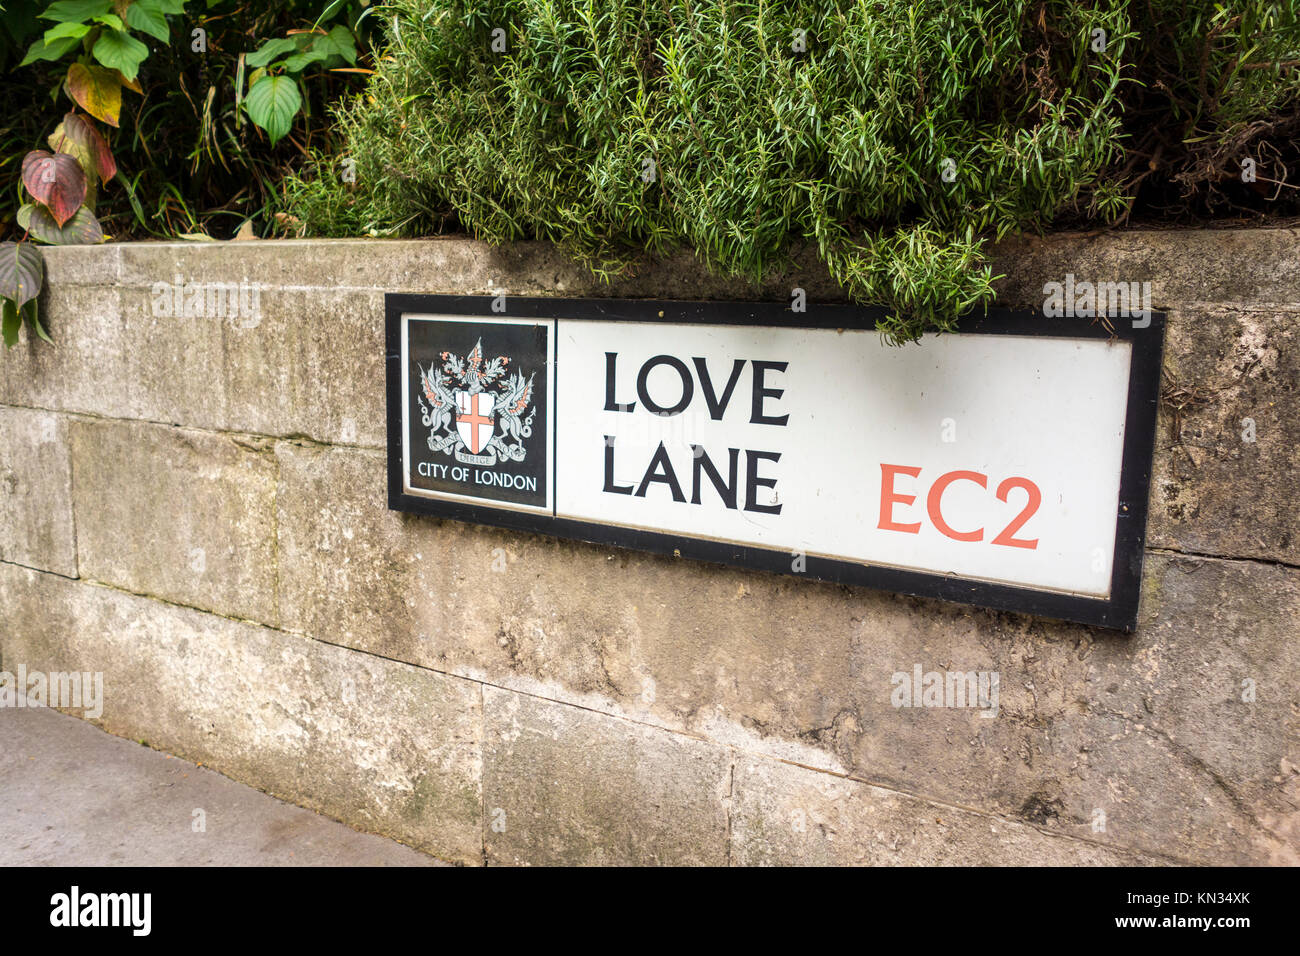 Love Lane, road name sign, City of London, UK - Stock Image